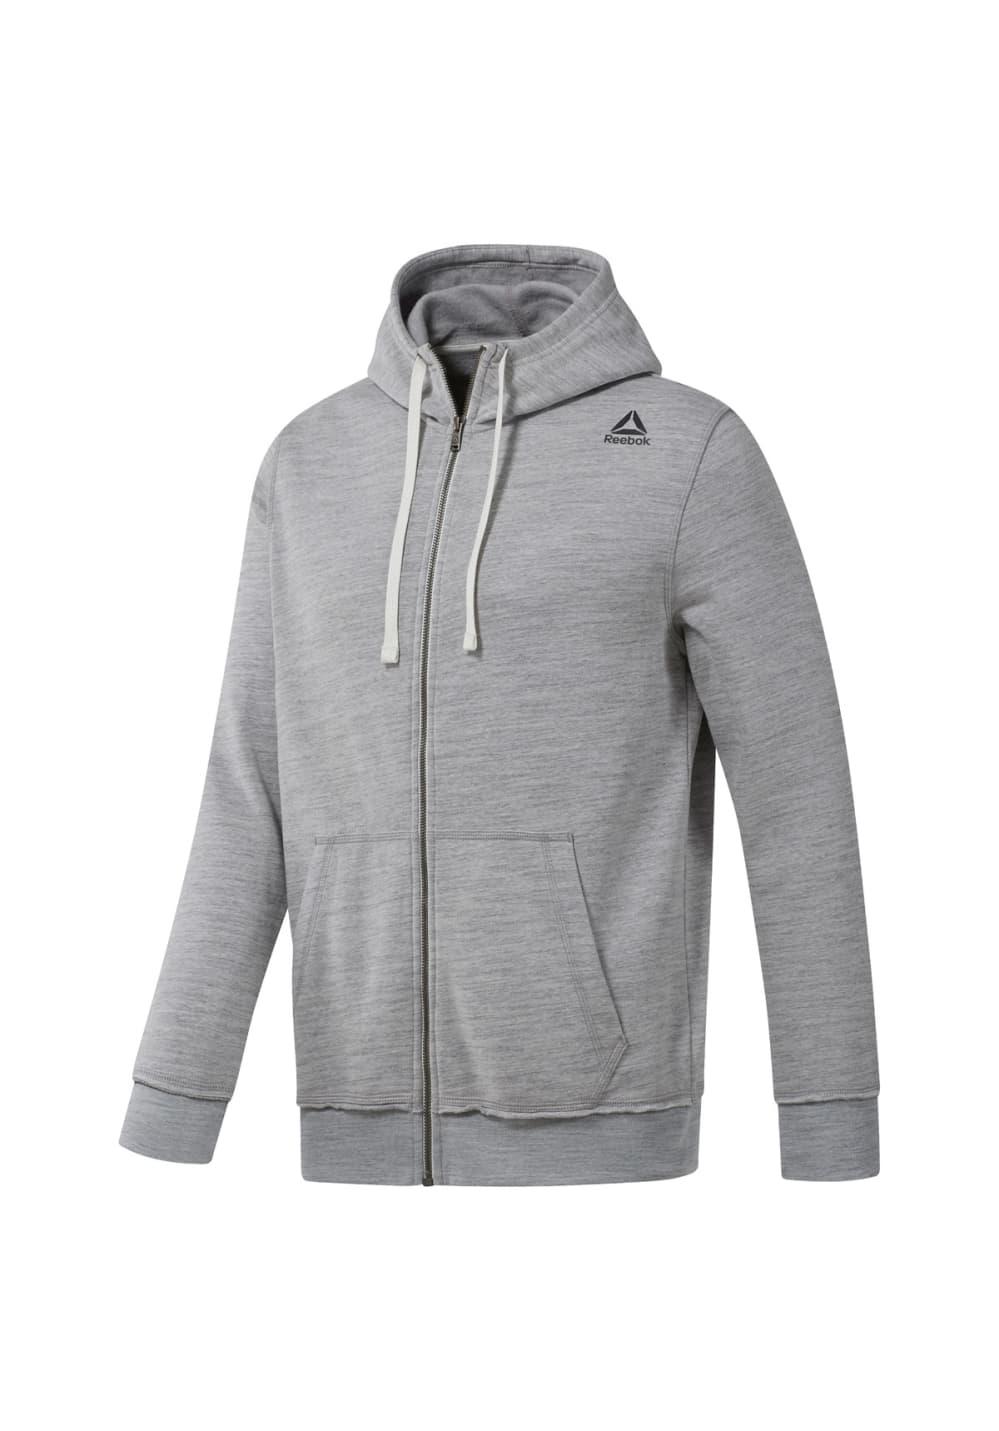 57ef2dc369 Reebok EL MARBLE GROUP FZ - Running jackets for Men - Grey